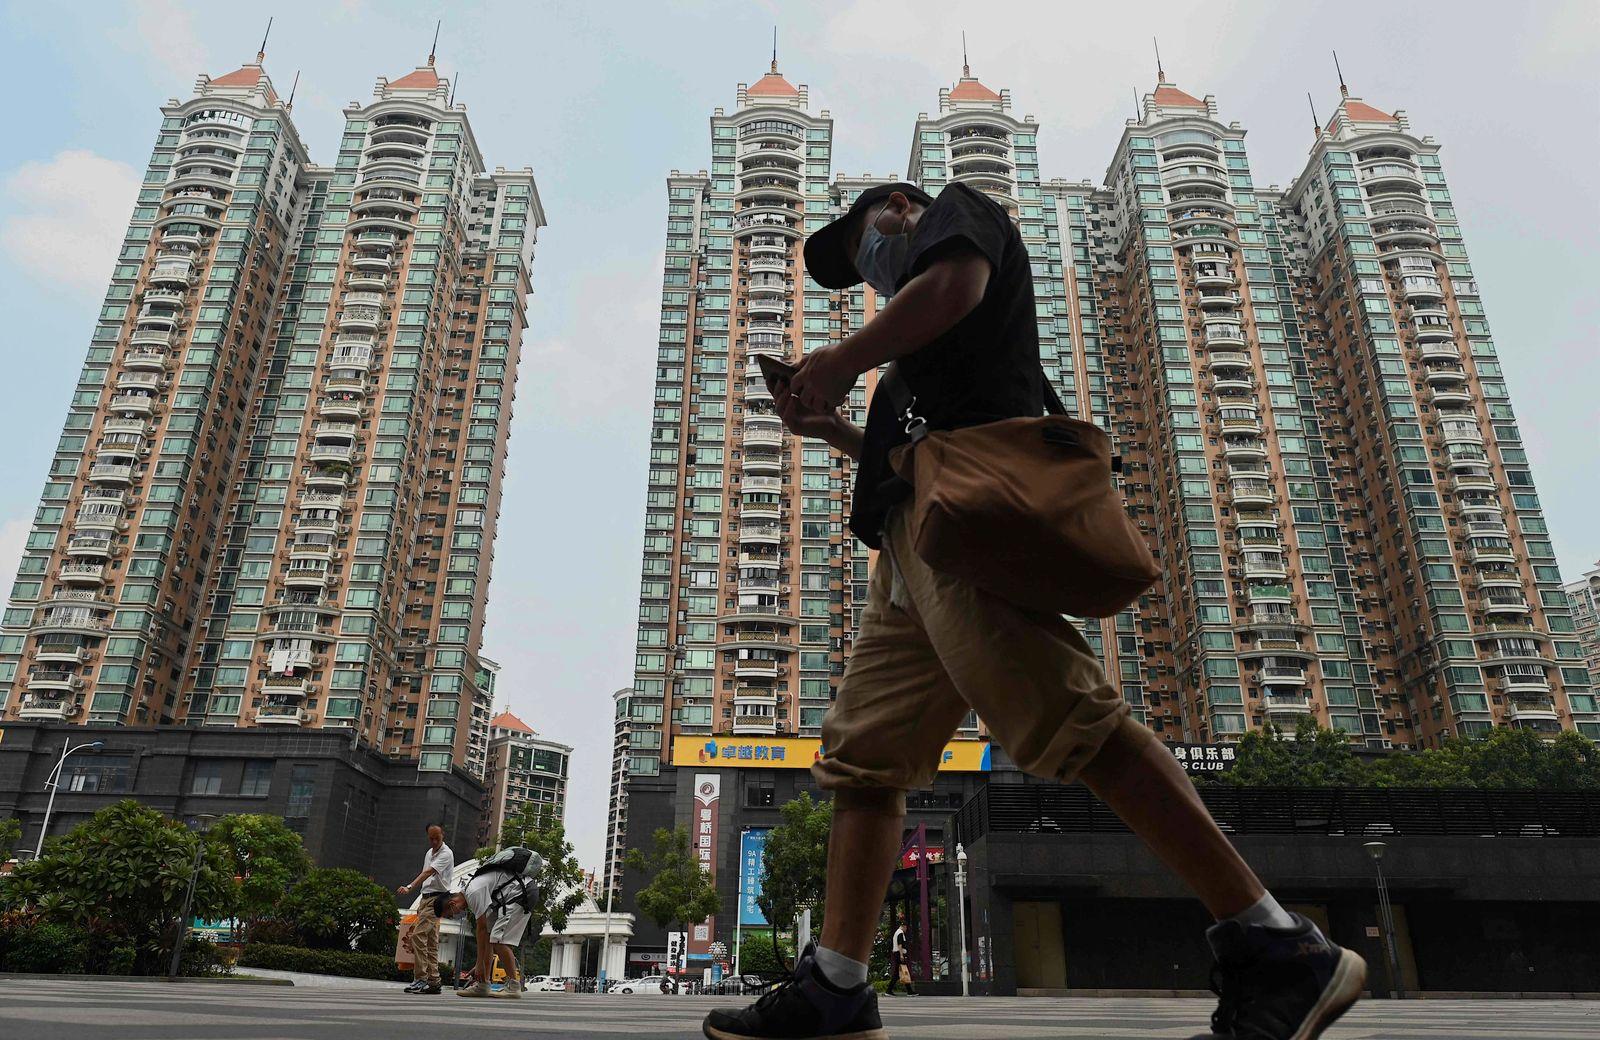 FILES-CHINA-ECONOMY-PROPERTY-EVERGRANDE